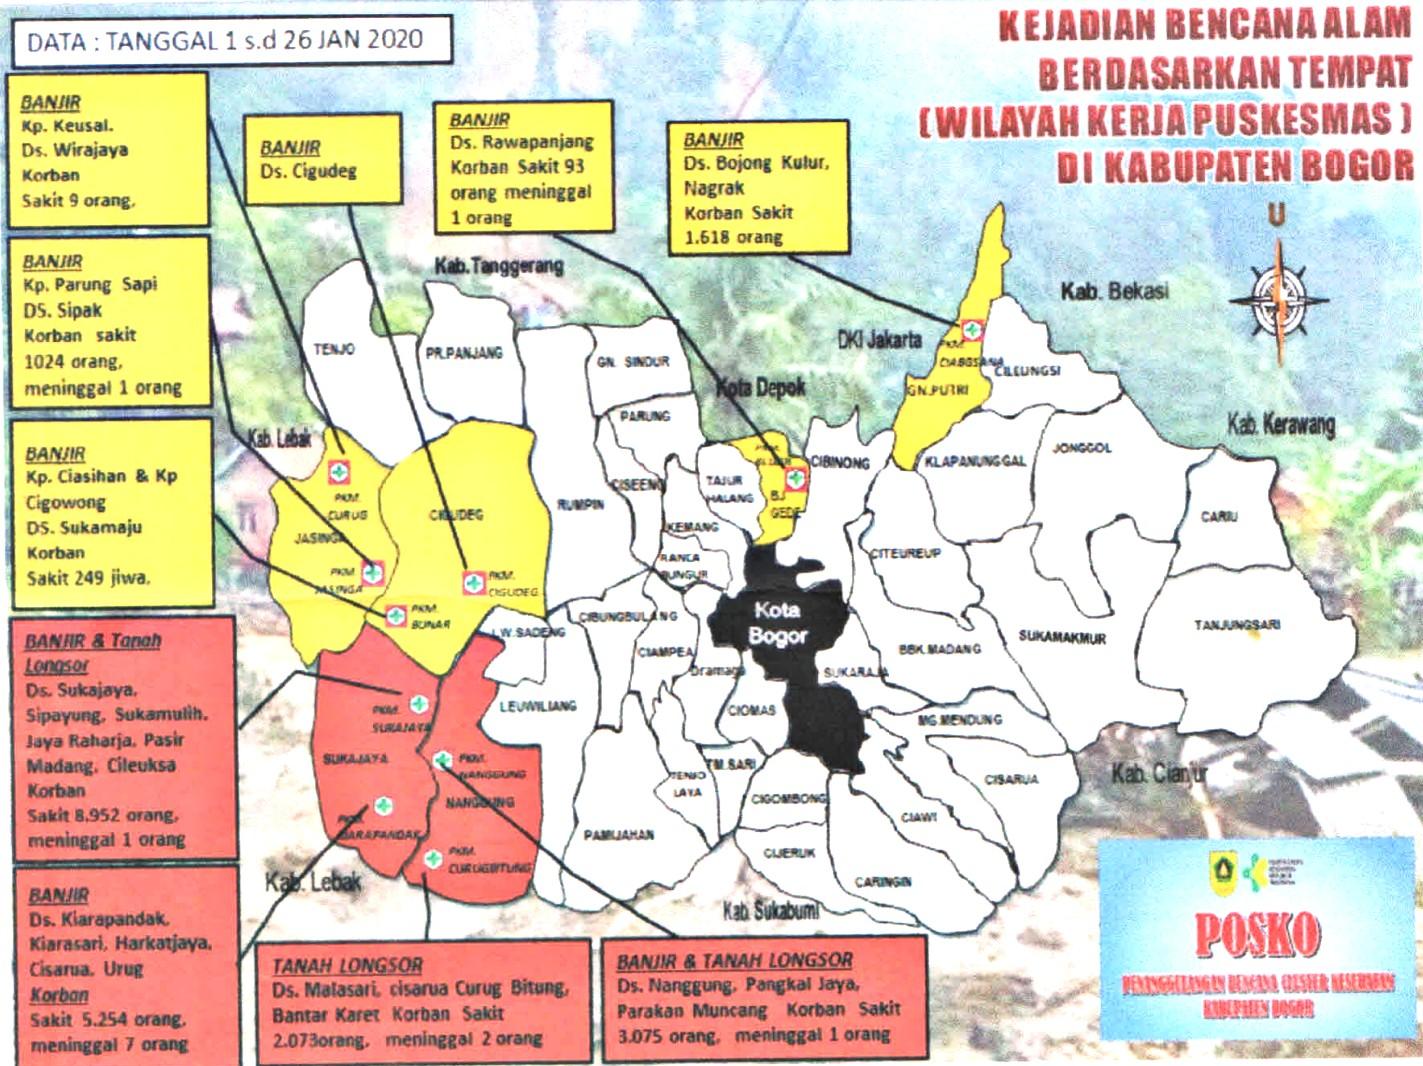 Data Sementara Penyakit Terbesar pada Korban Bencana Kabupaten Bogor